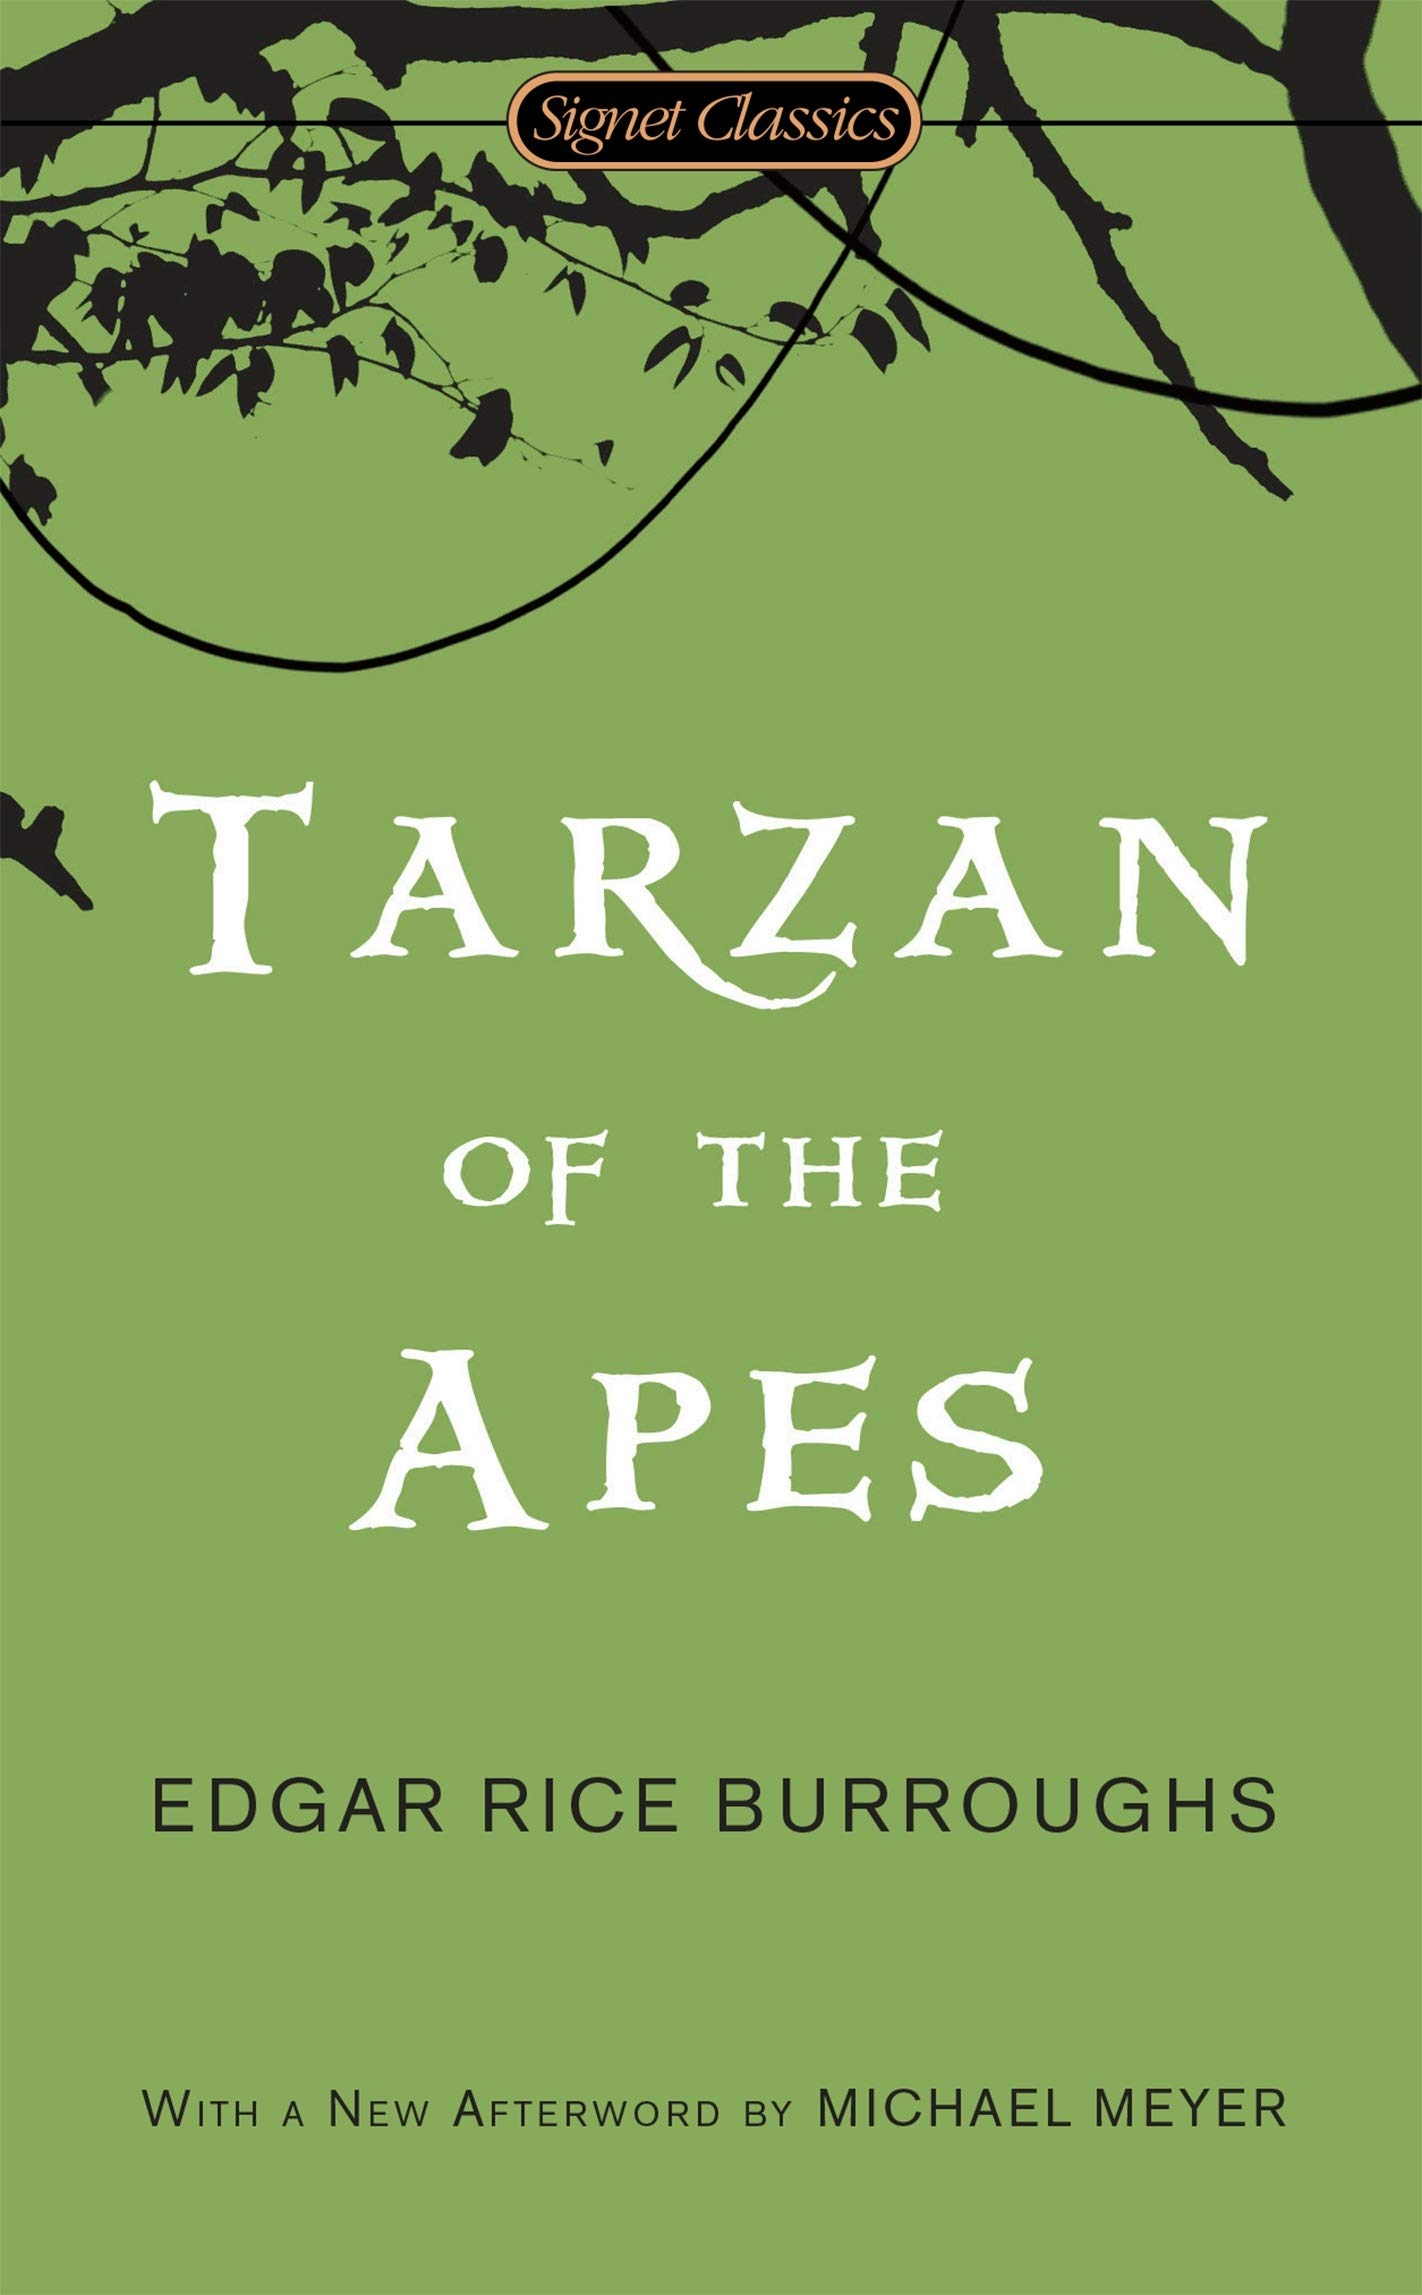 Photo of page Burroughs TARZAN OF THE APES manuscript